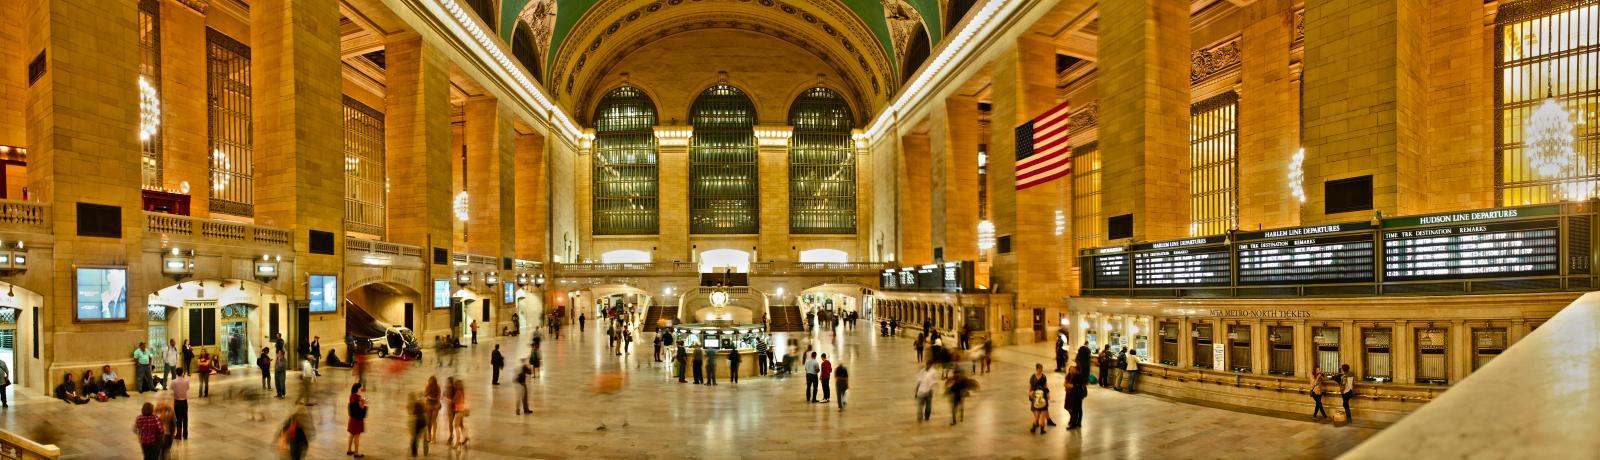 4 Fakten über die Grand Central Station